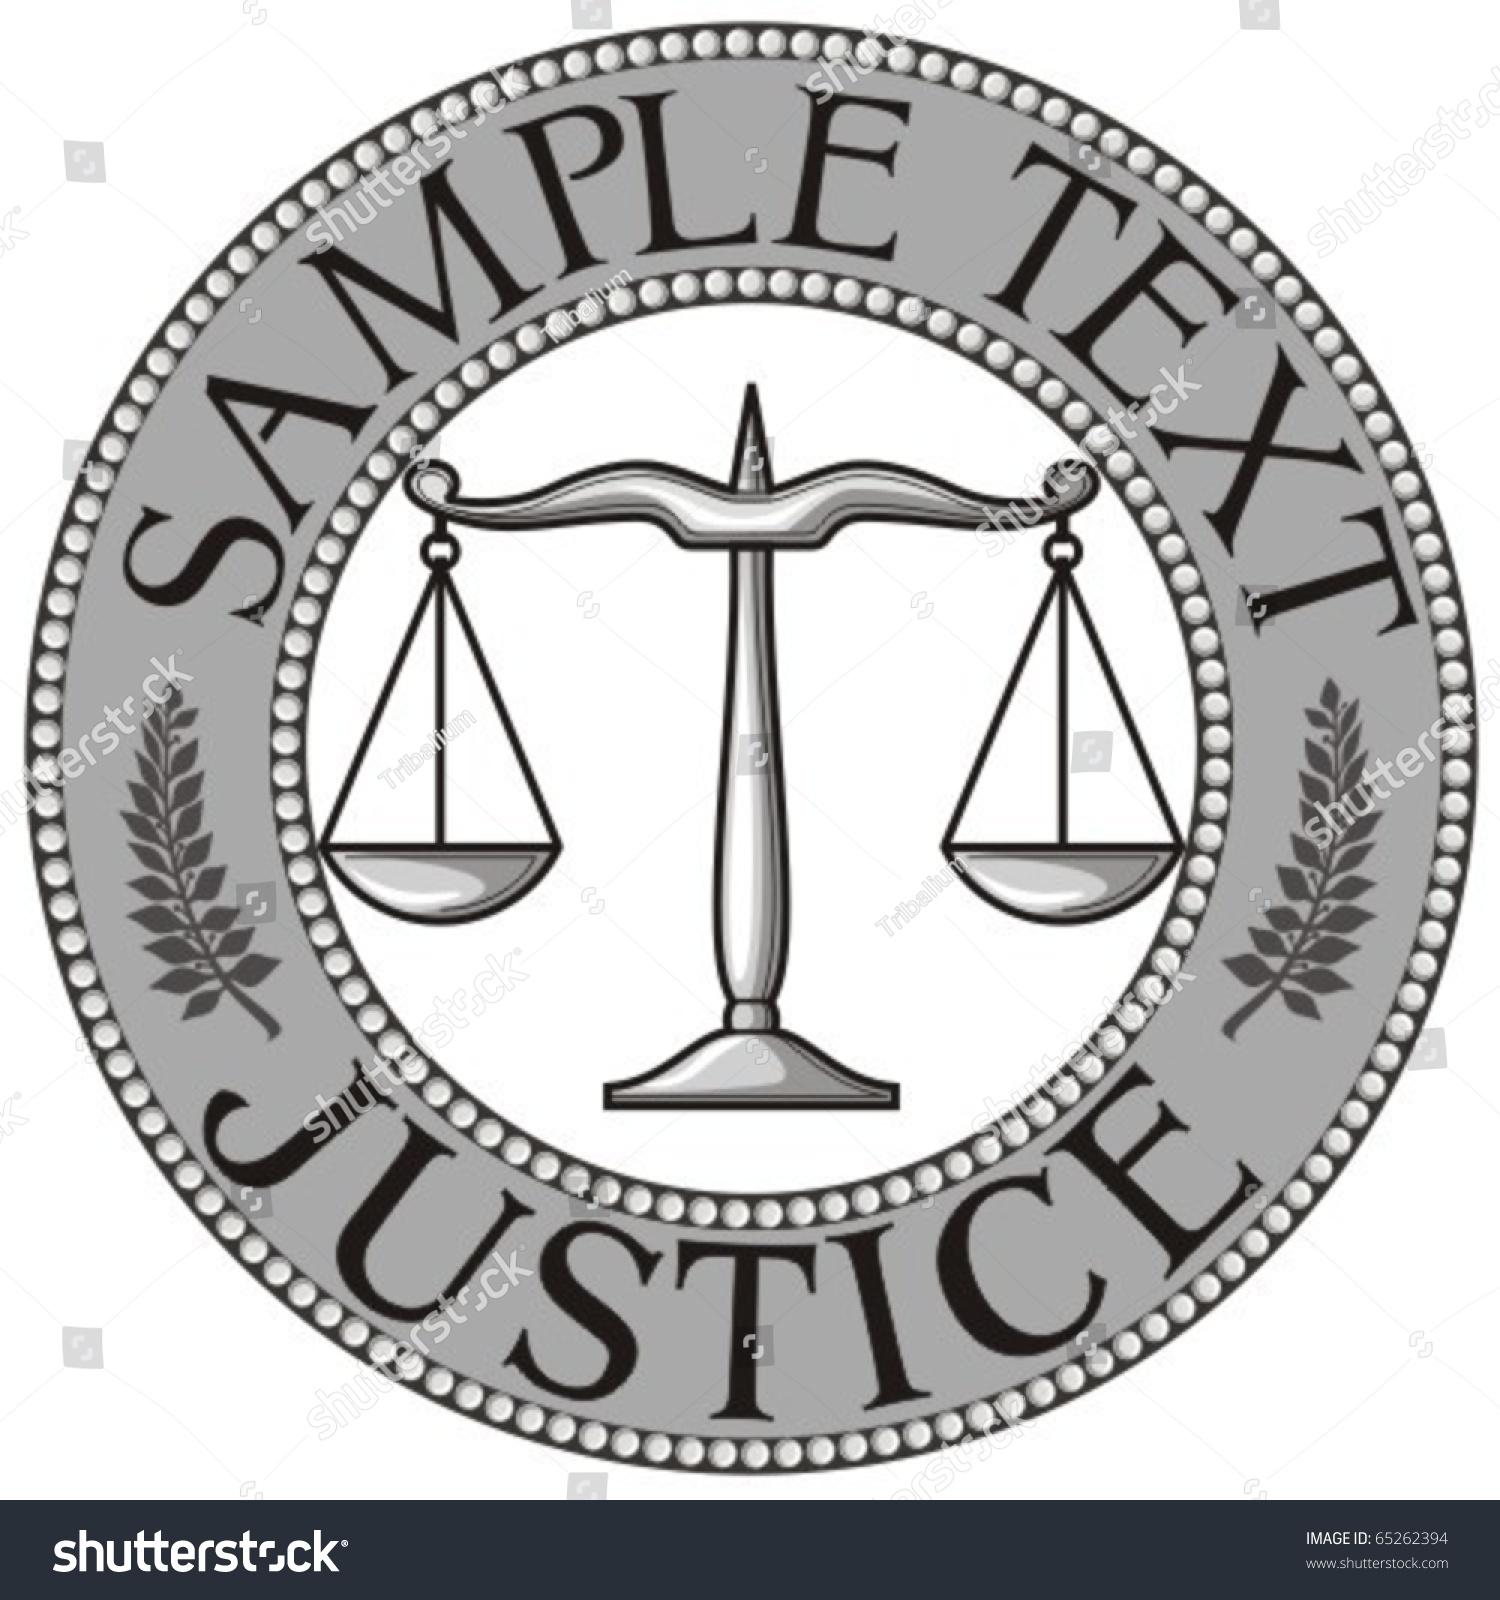 Scales Justice Seal Symbol Stock Vector Royalty Free 65262394